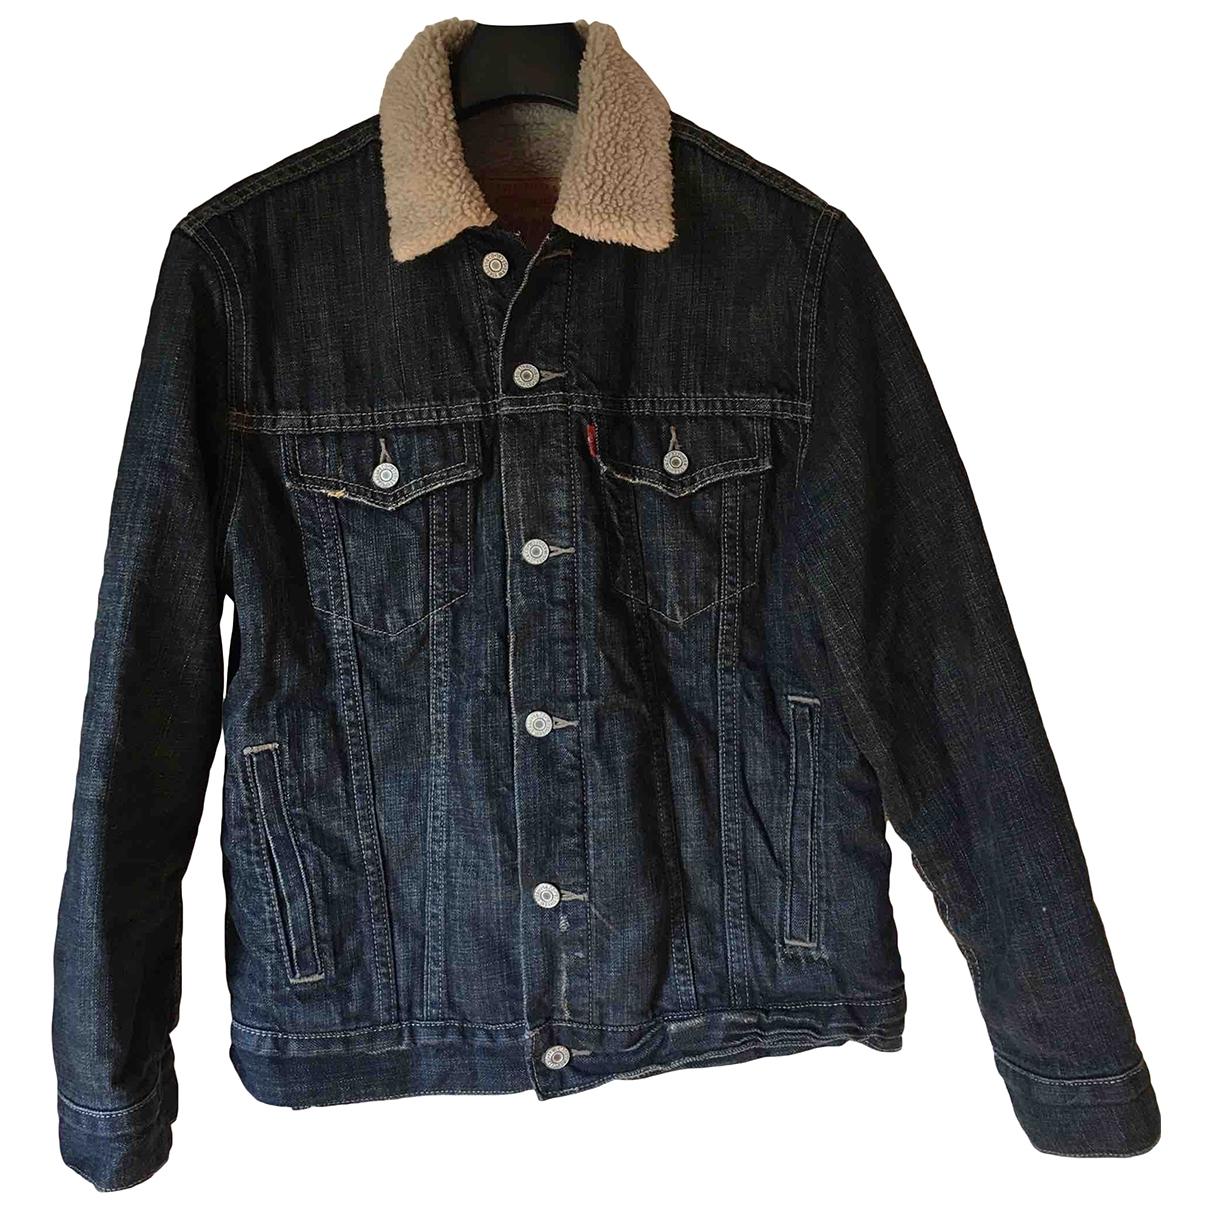 Levi's \N Navy Denim - Jeans jacket  for Men M International